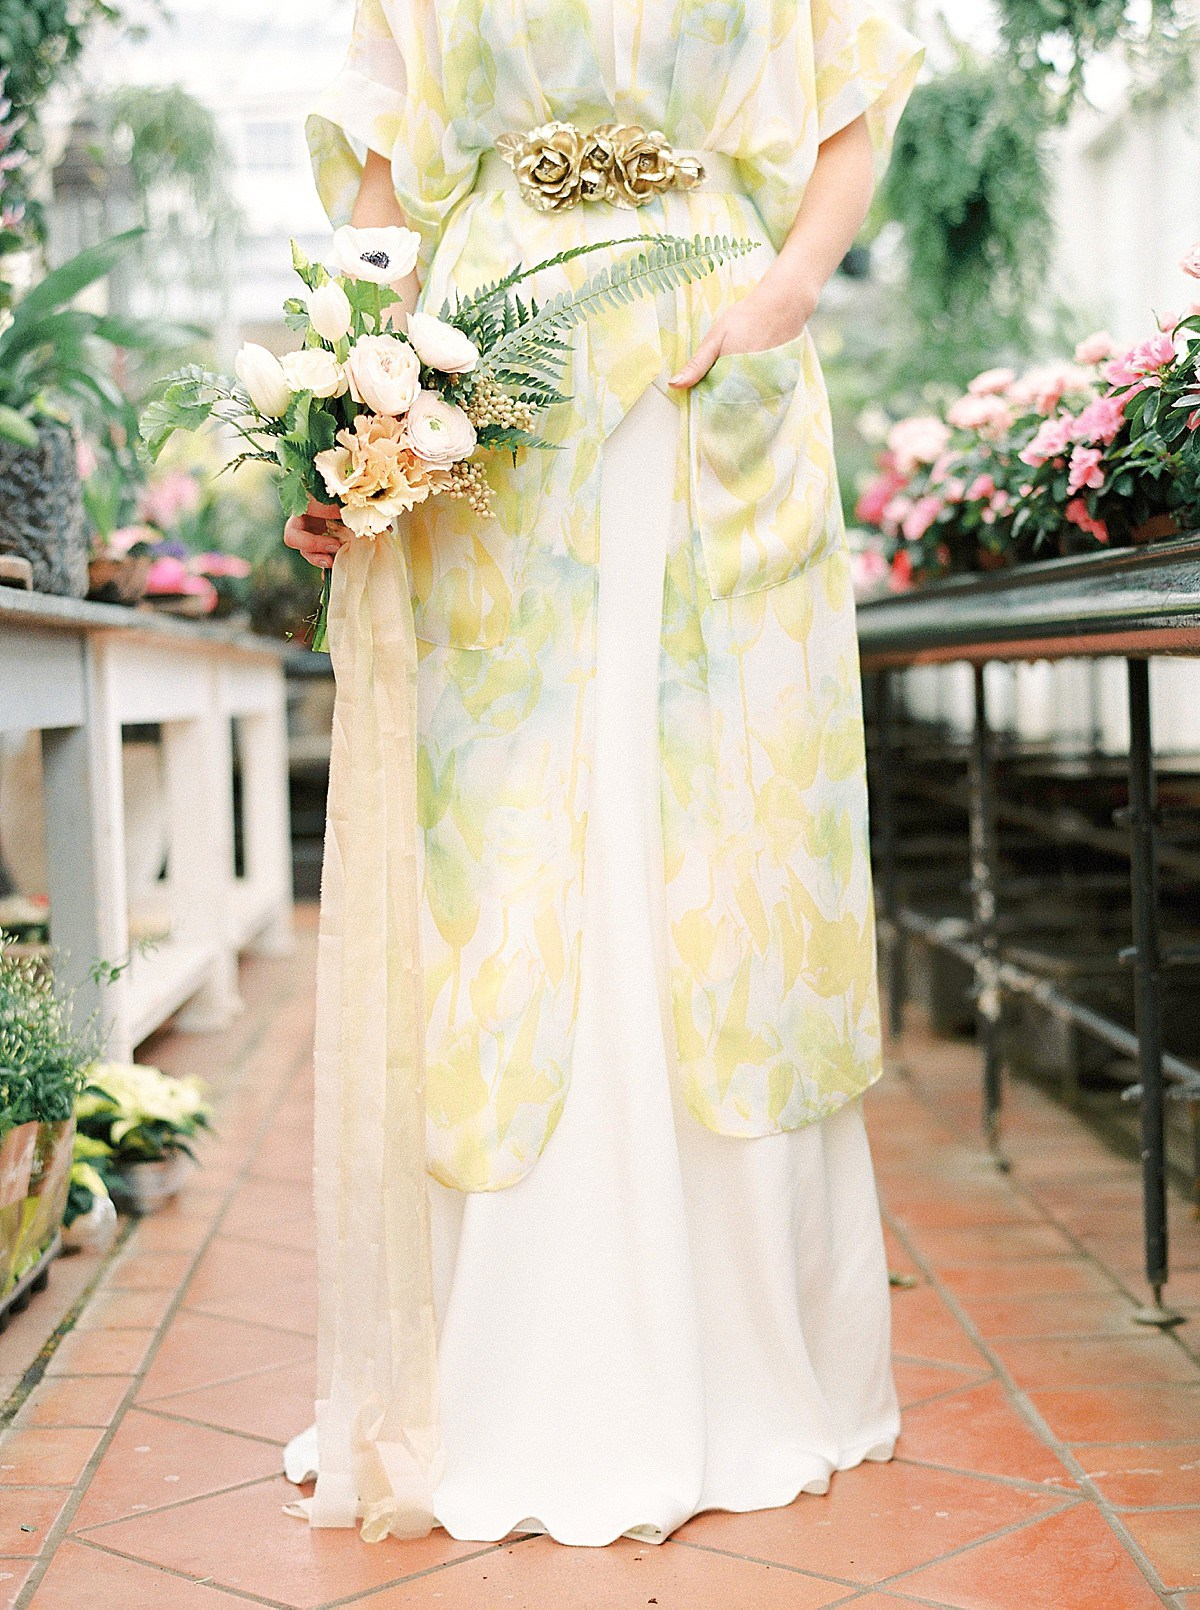 de Winton Paper co | elegant-luxe-wedding-ideas - de Winton Paper co